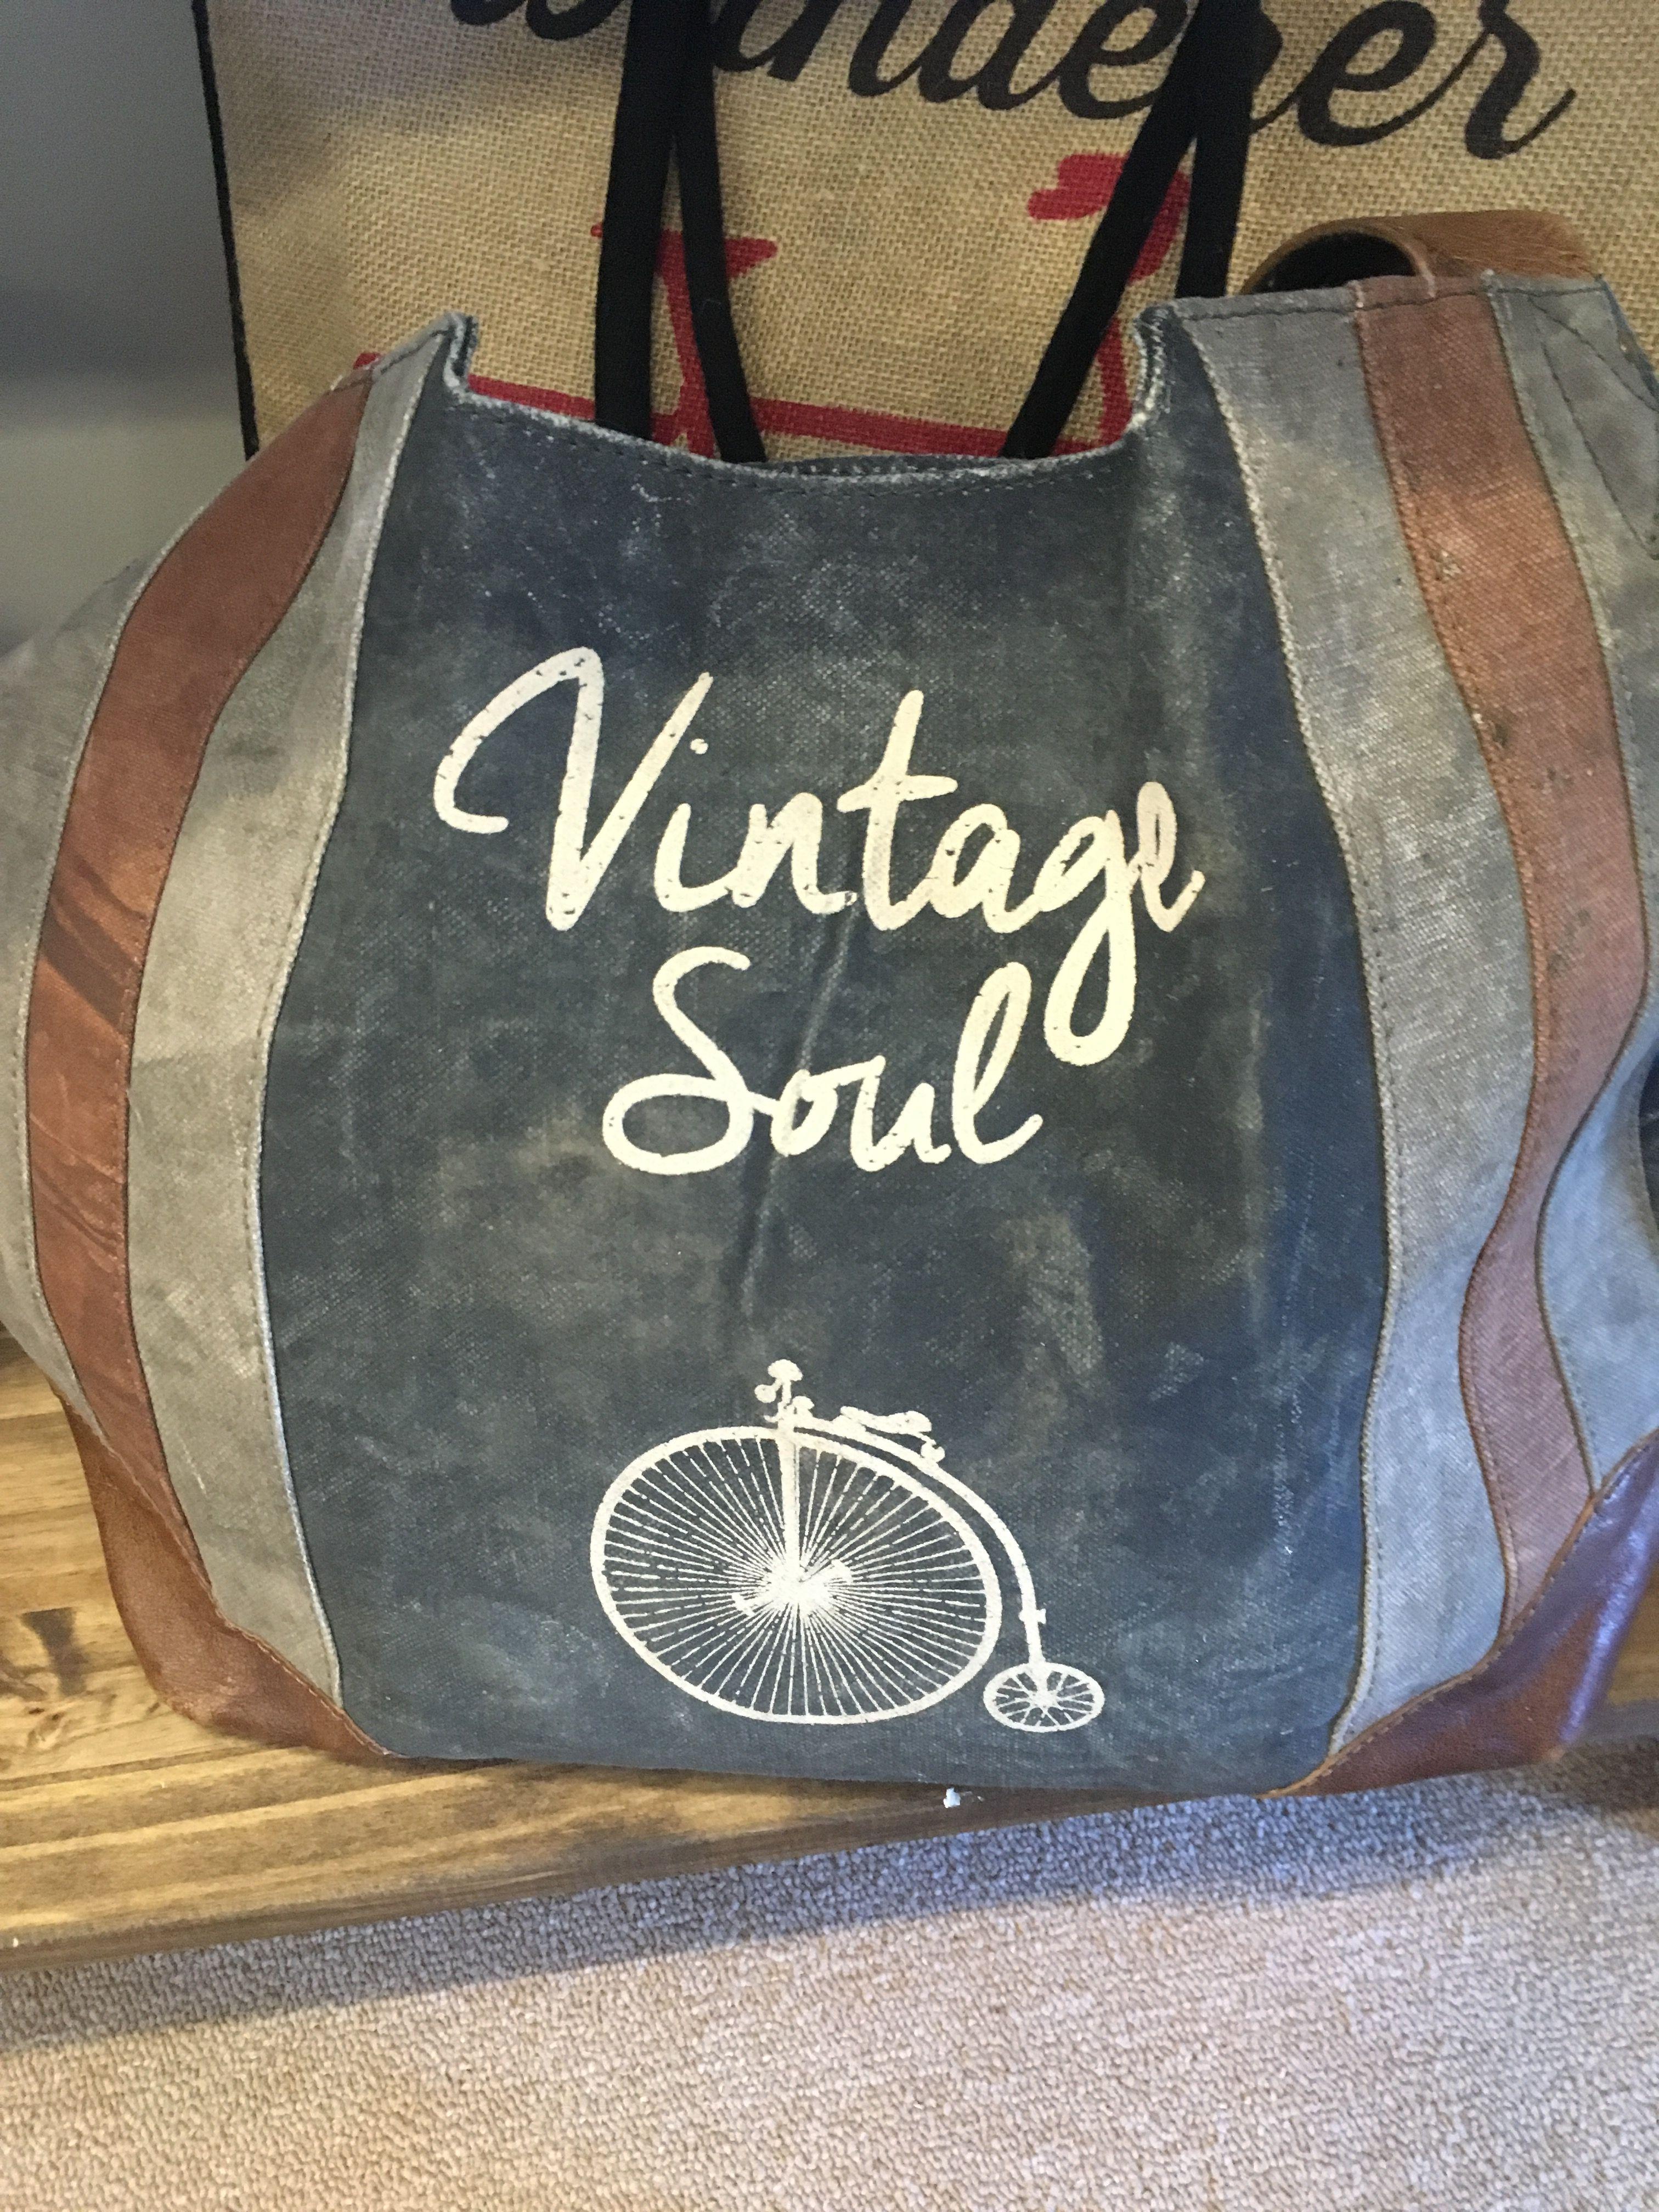 Pin by Sonya Compton on Cricut Bags, Vintage soul, Duffle